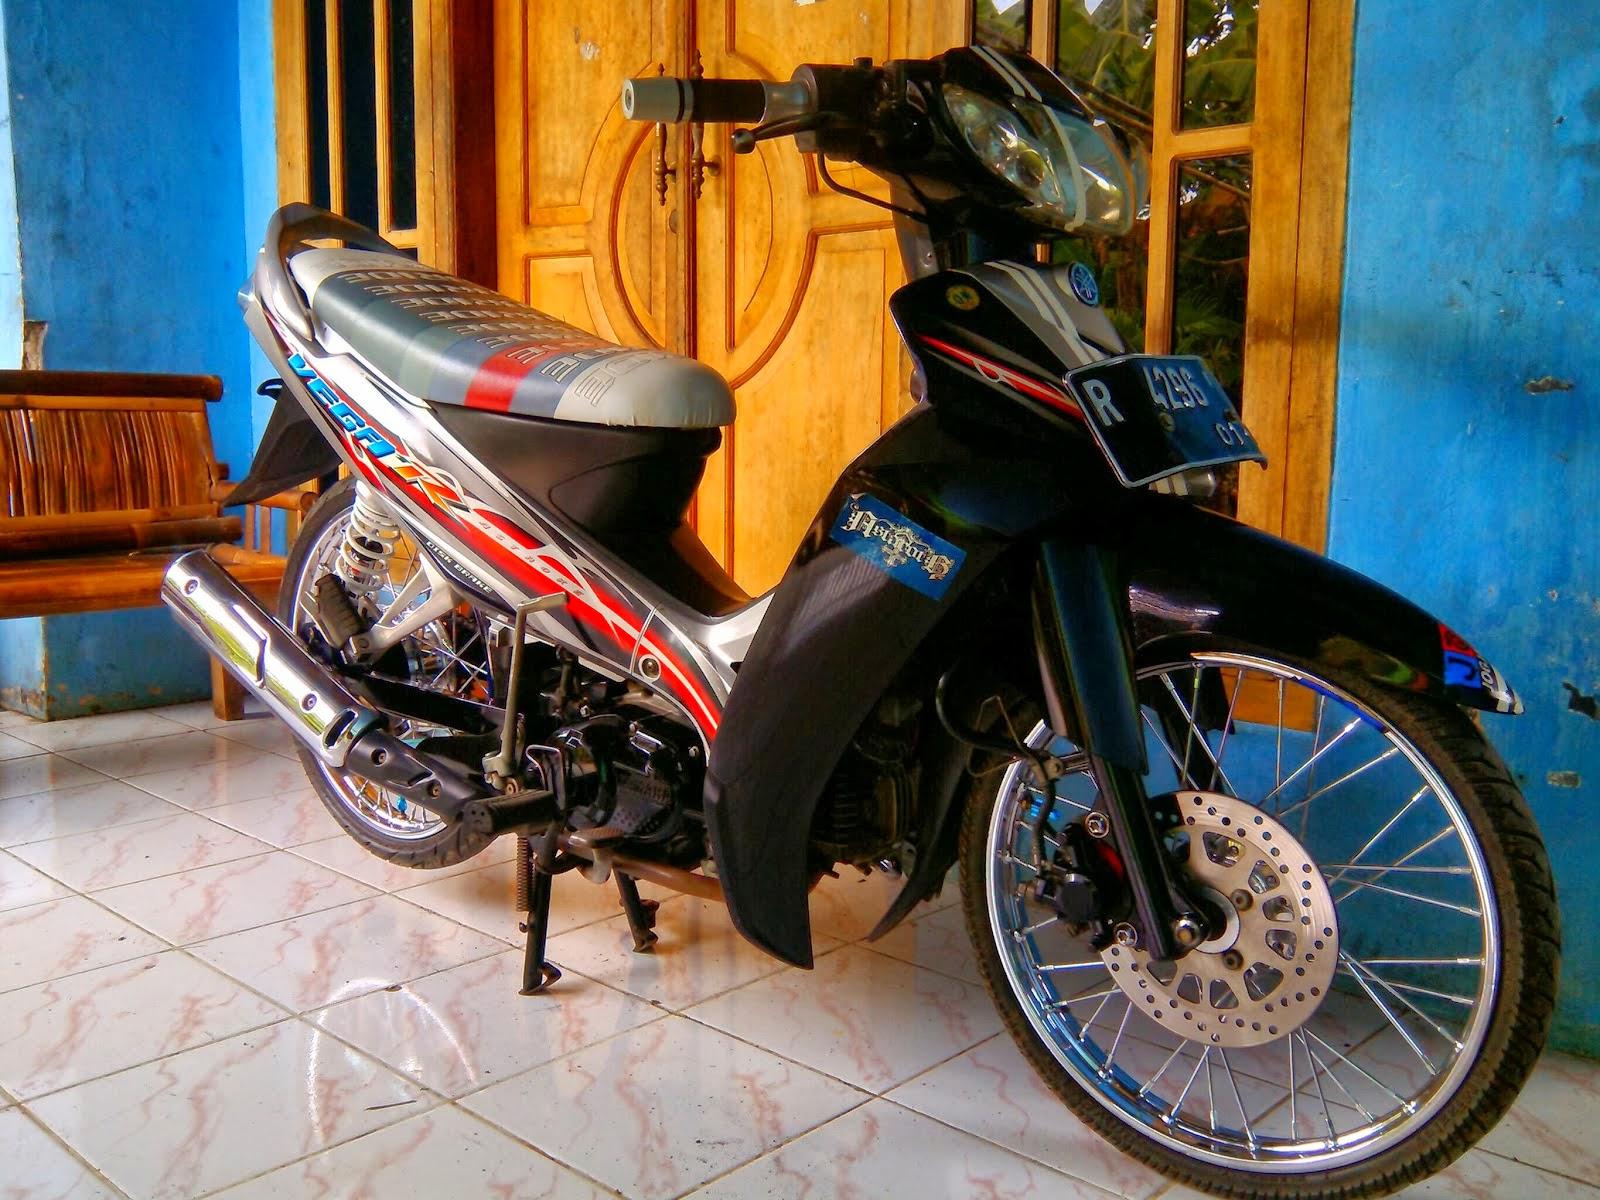 Modif Motor Yamaha Vega R 2008